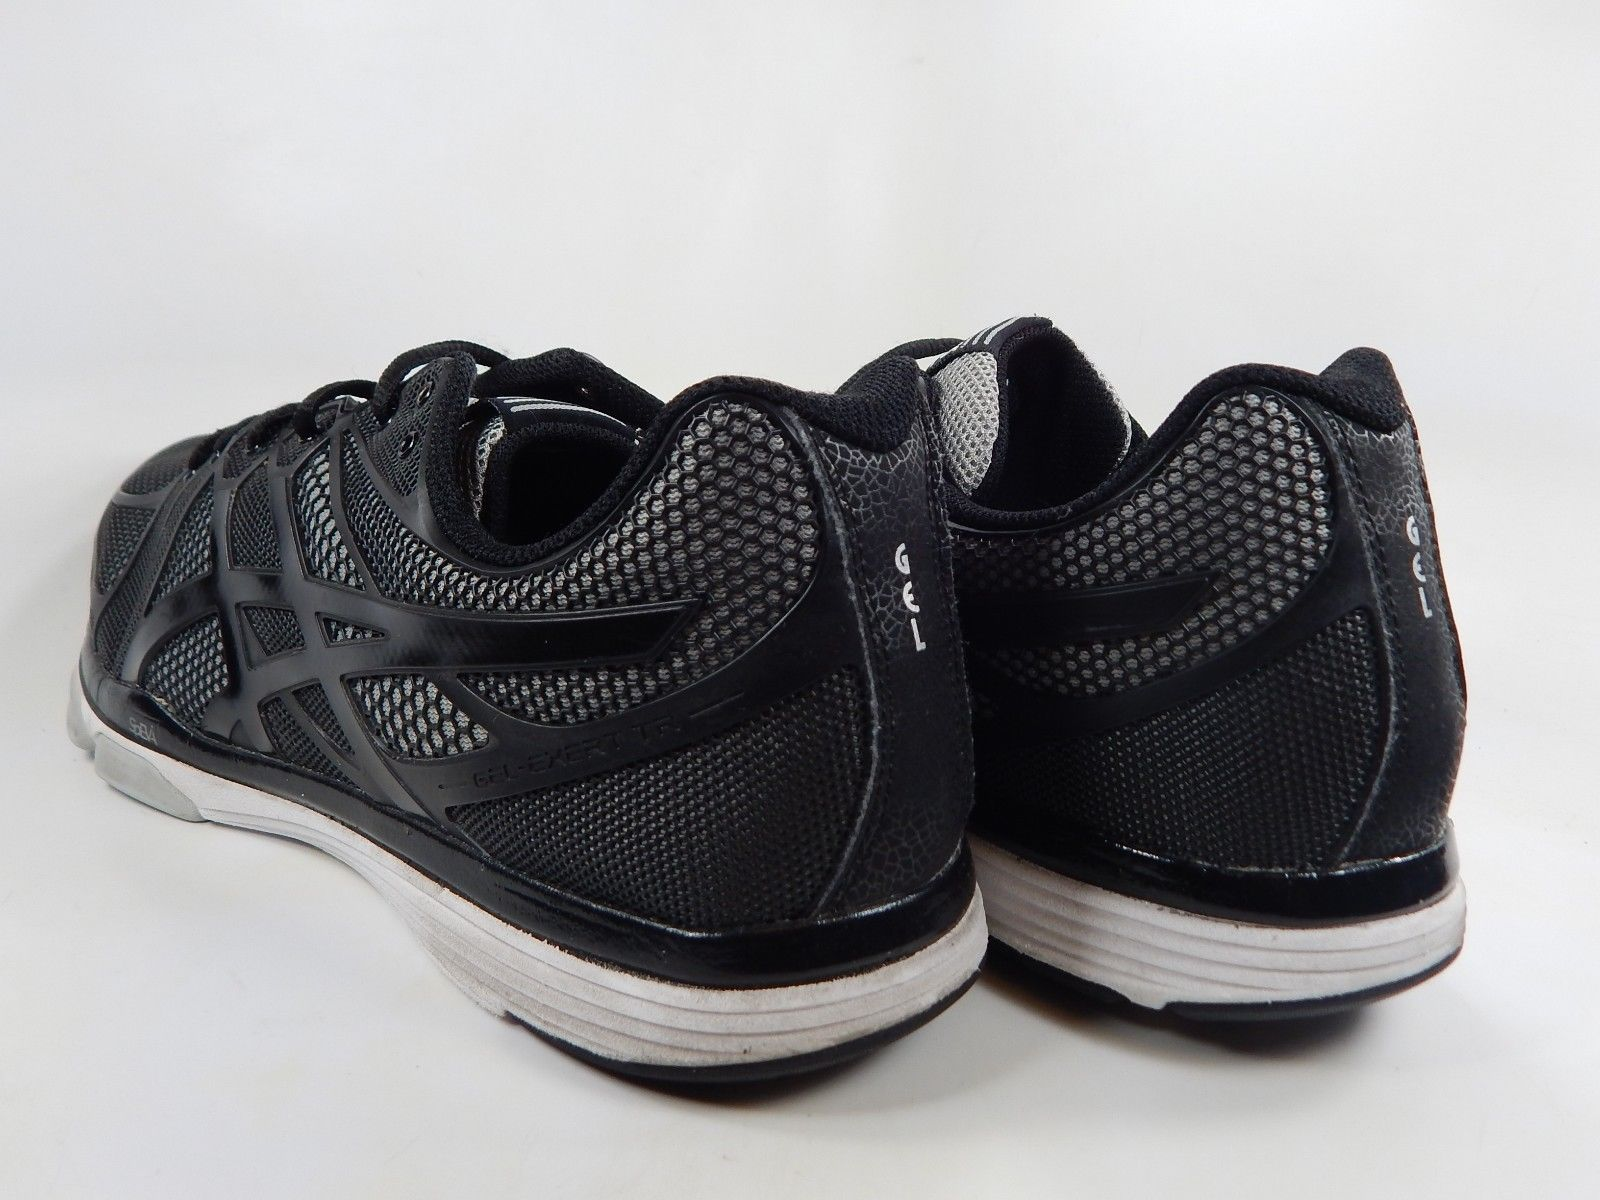 Asics Gel Exert TR 4 Size US 12.5 M (D) EU 47 Men's Training Shoes Black S410N